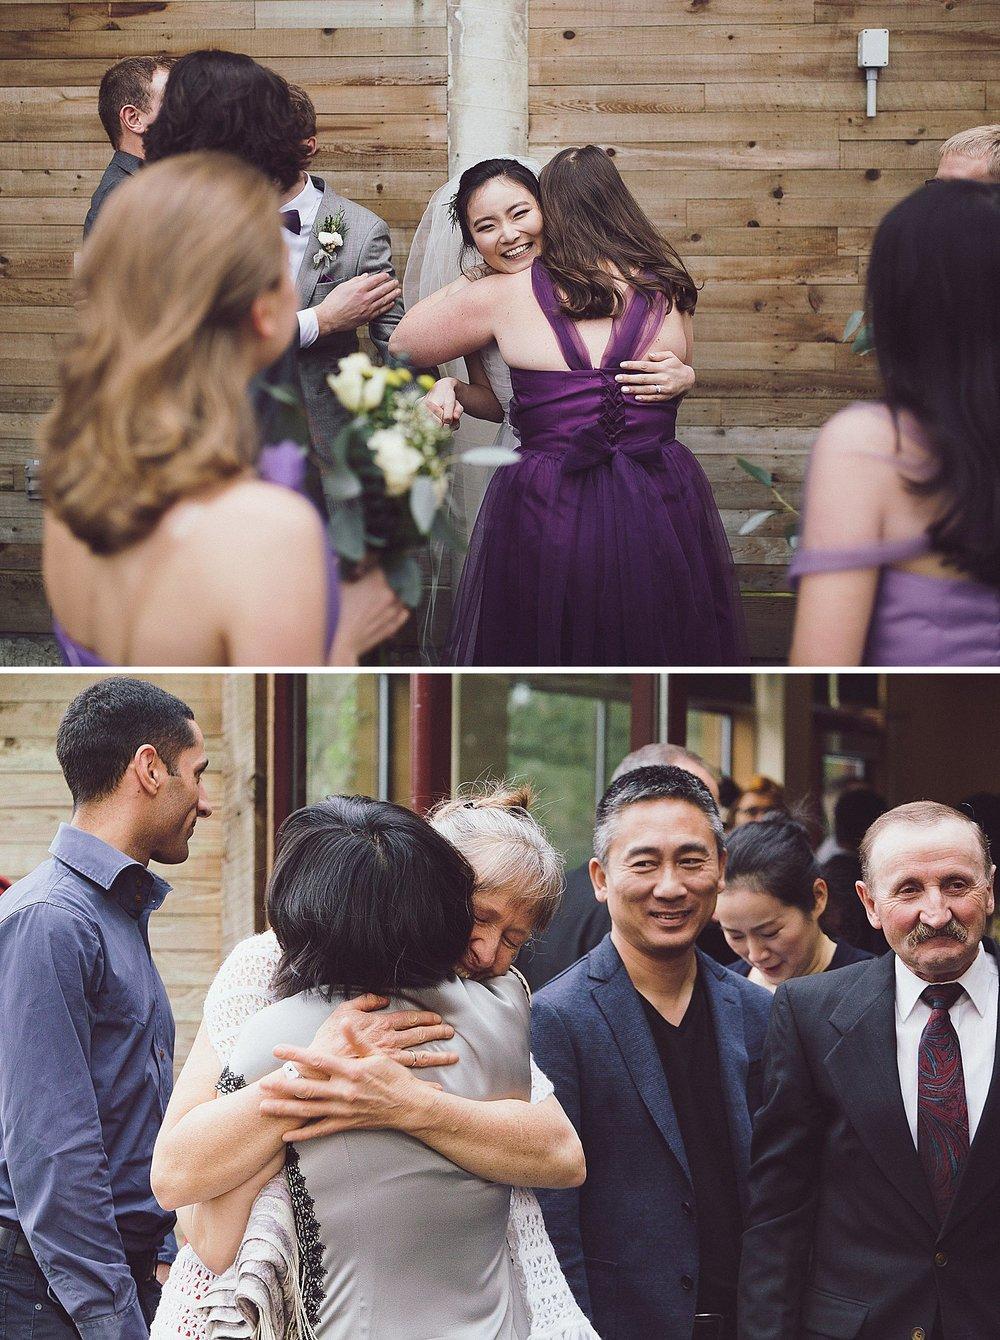 Everyone giving congratulatory hugs to the bride and groom